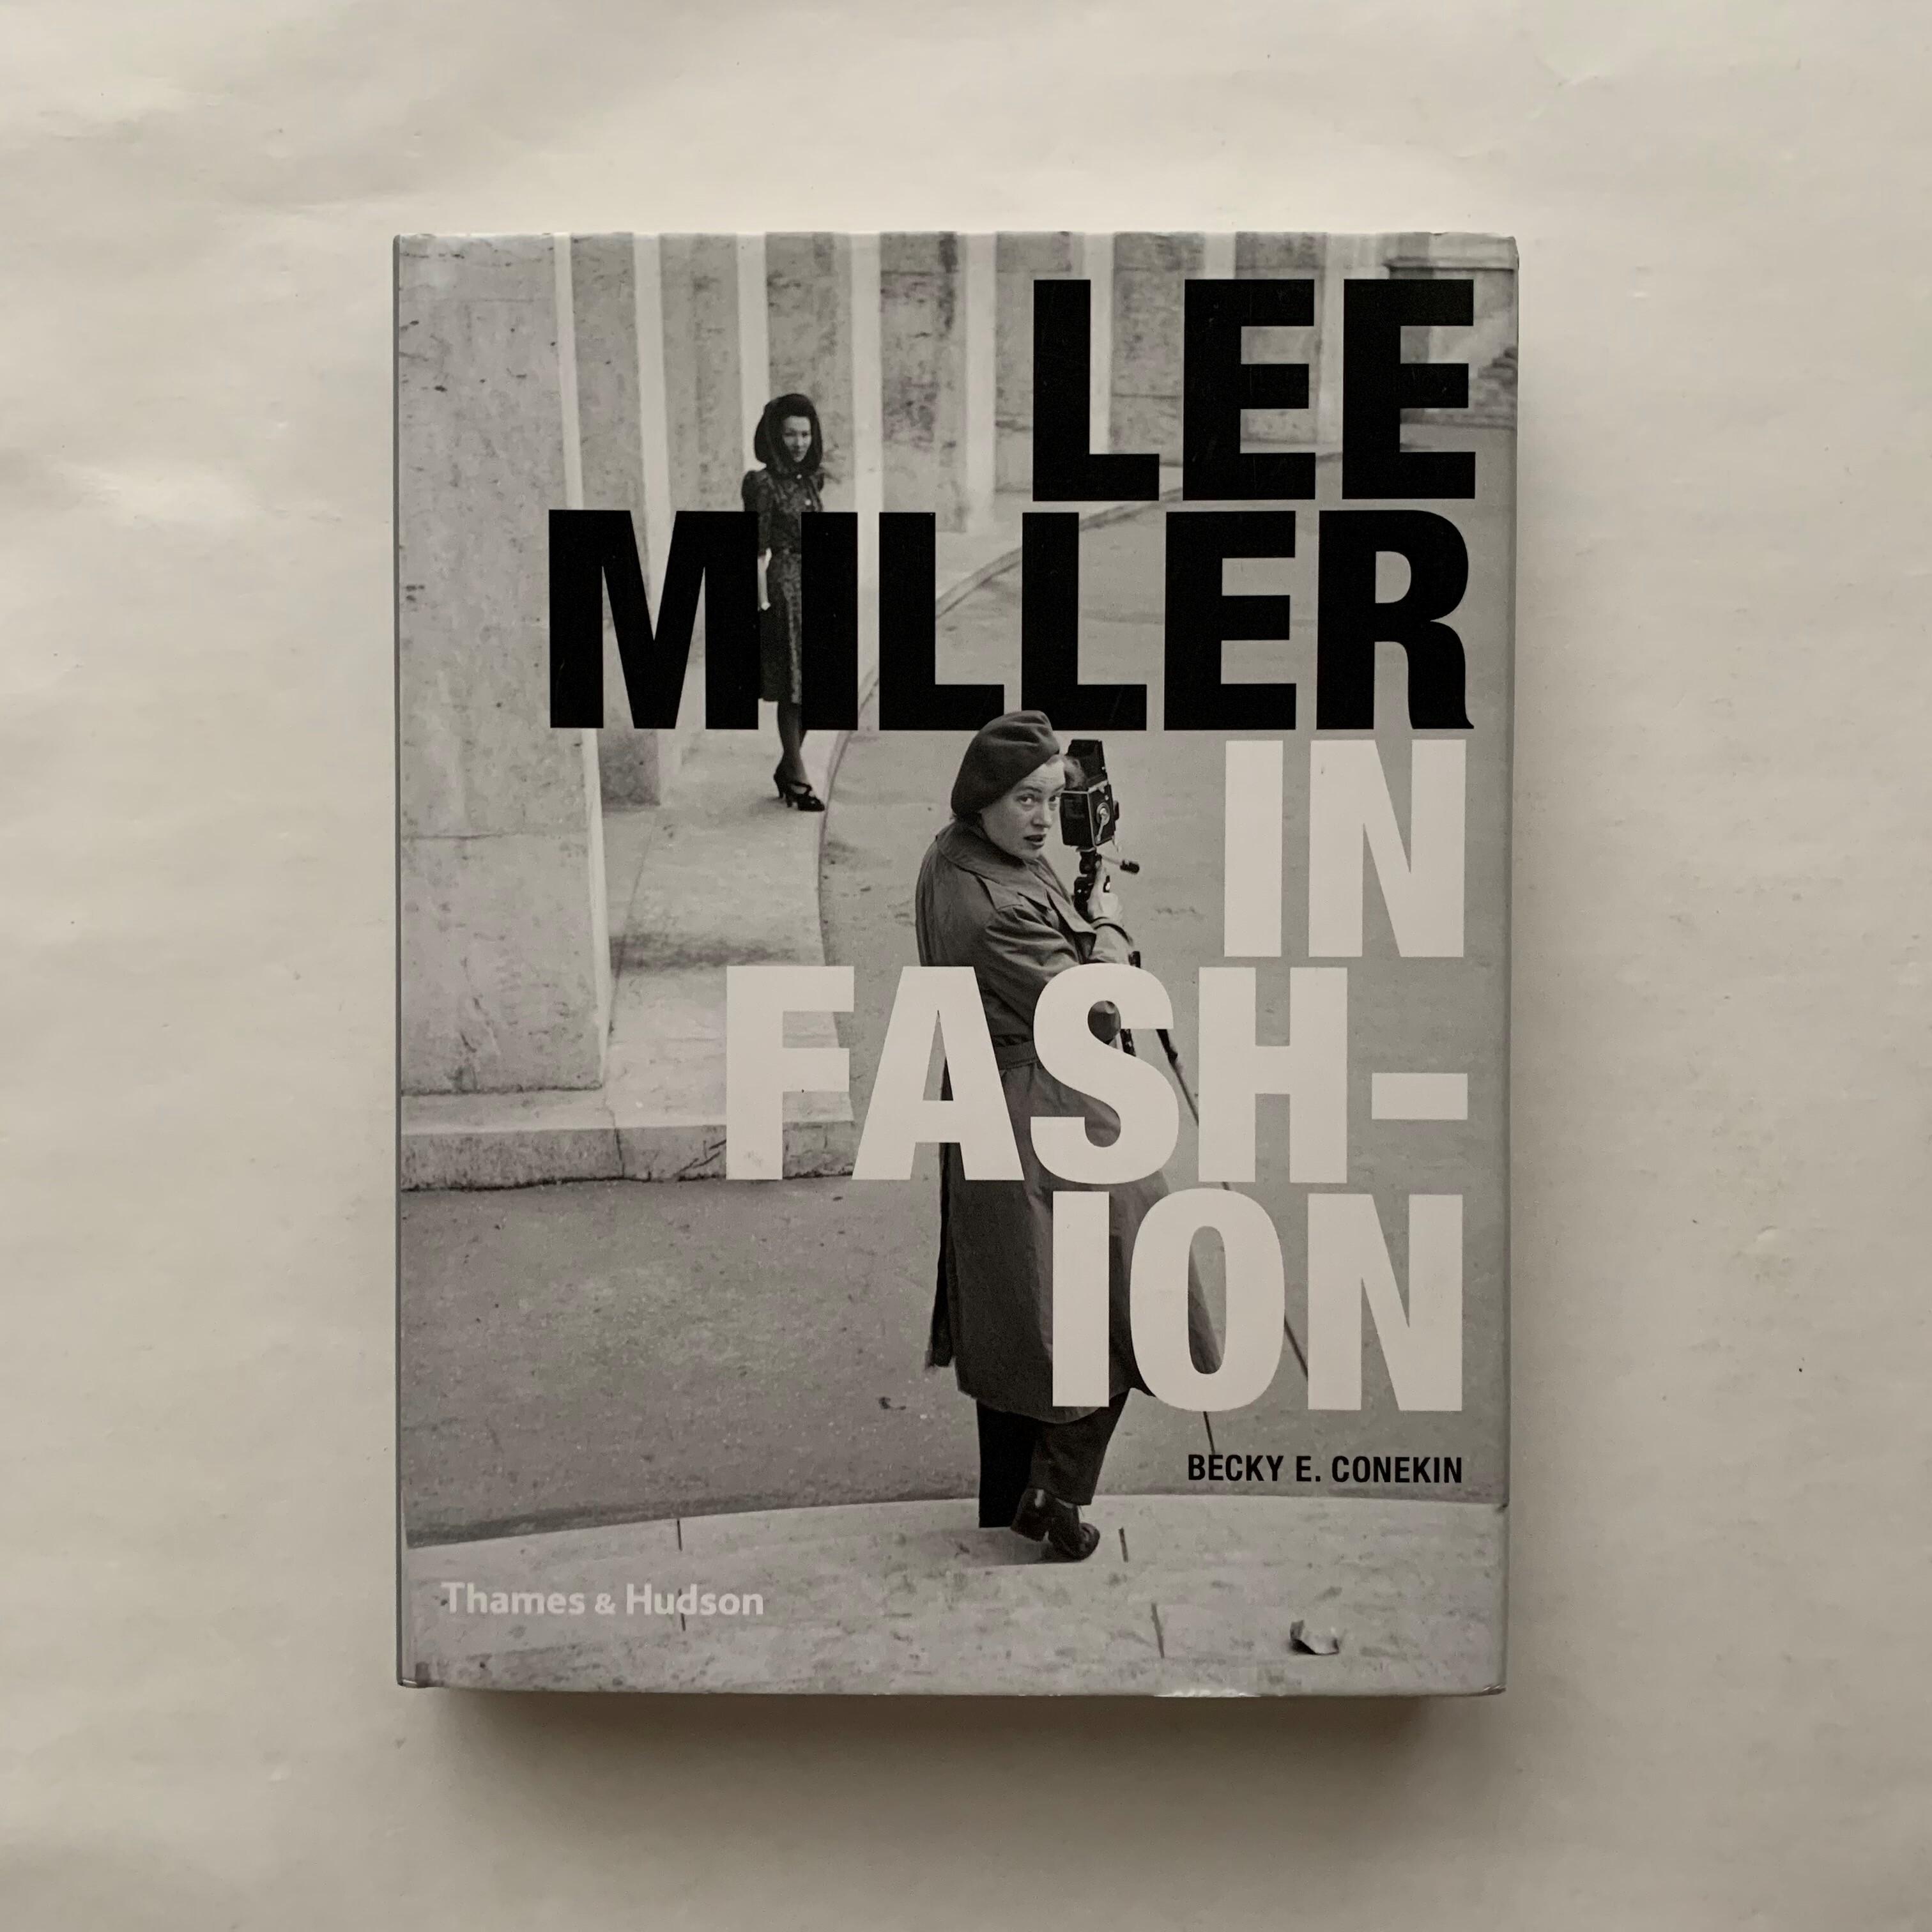 Lee Miller in Fashion  /  Becky E. Conekin